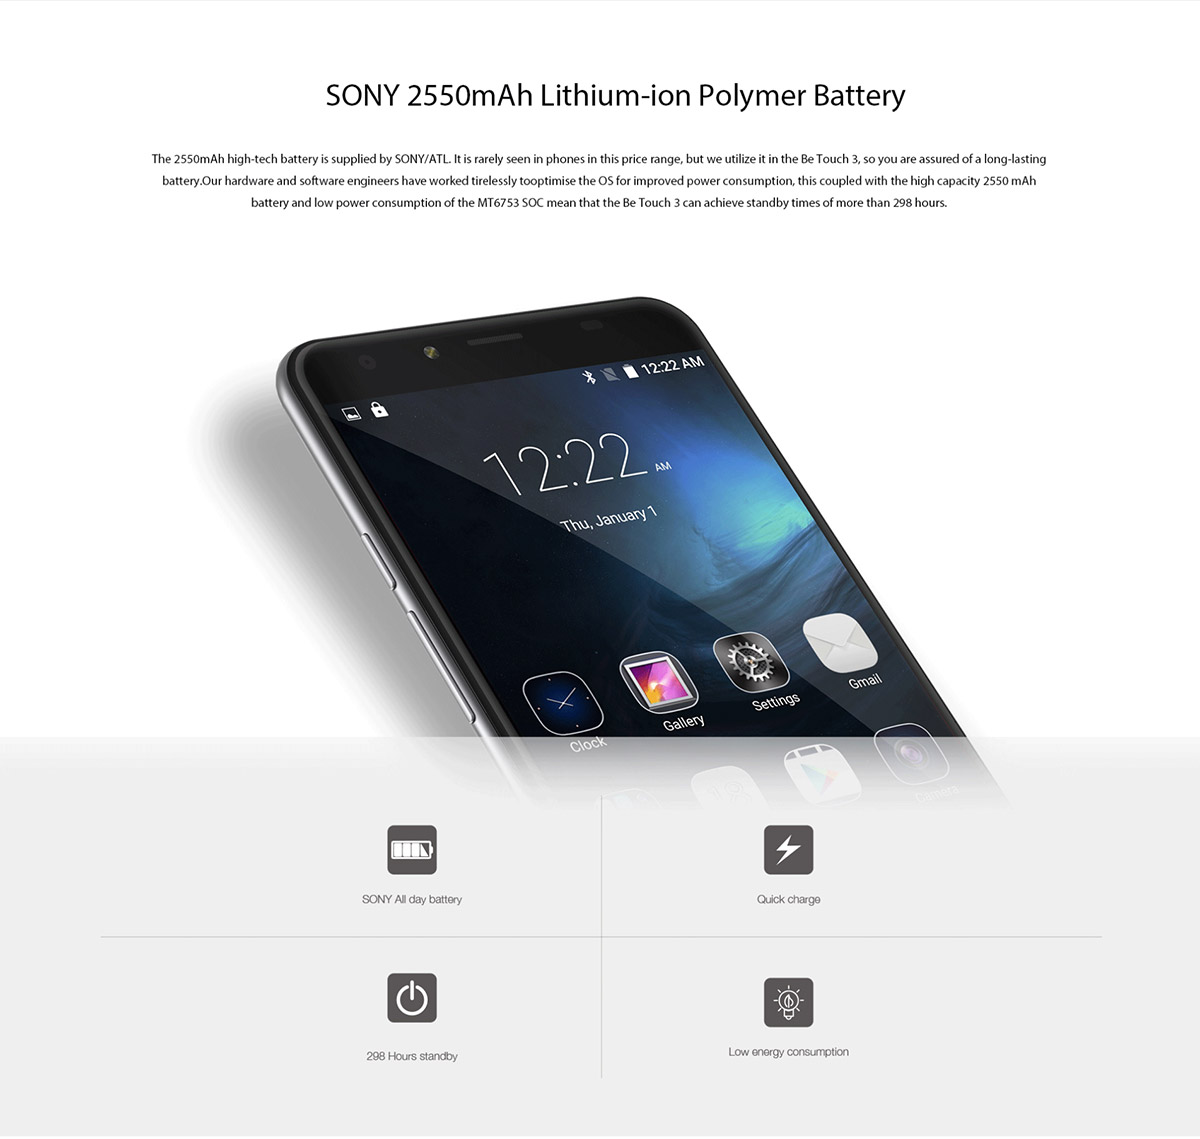 Ulefone Be Touch 3, Test, Testbericht, Antutu, Angebot, Handy ohne Vertrag, Akku Sony, Benchmarks